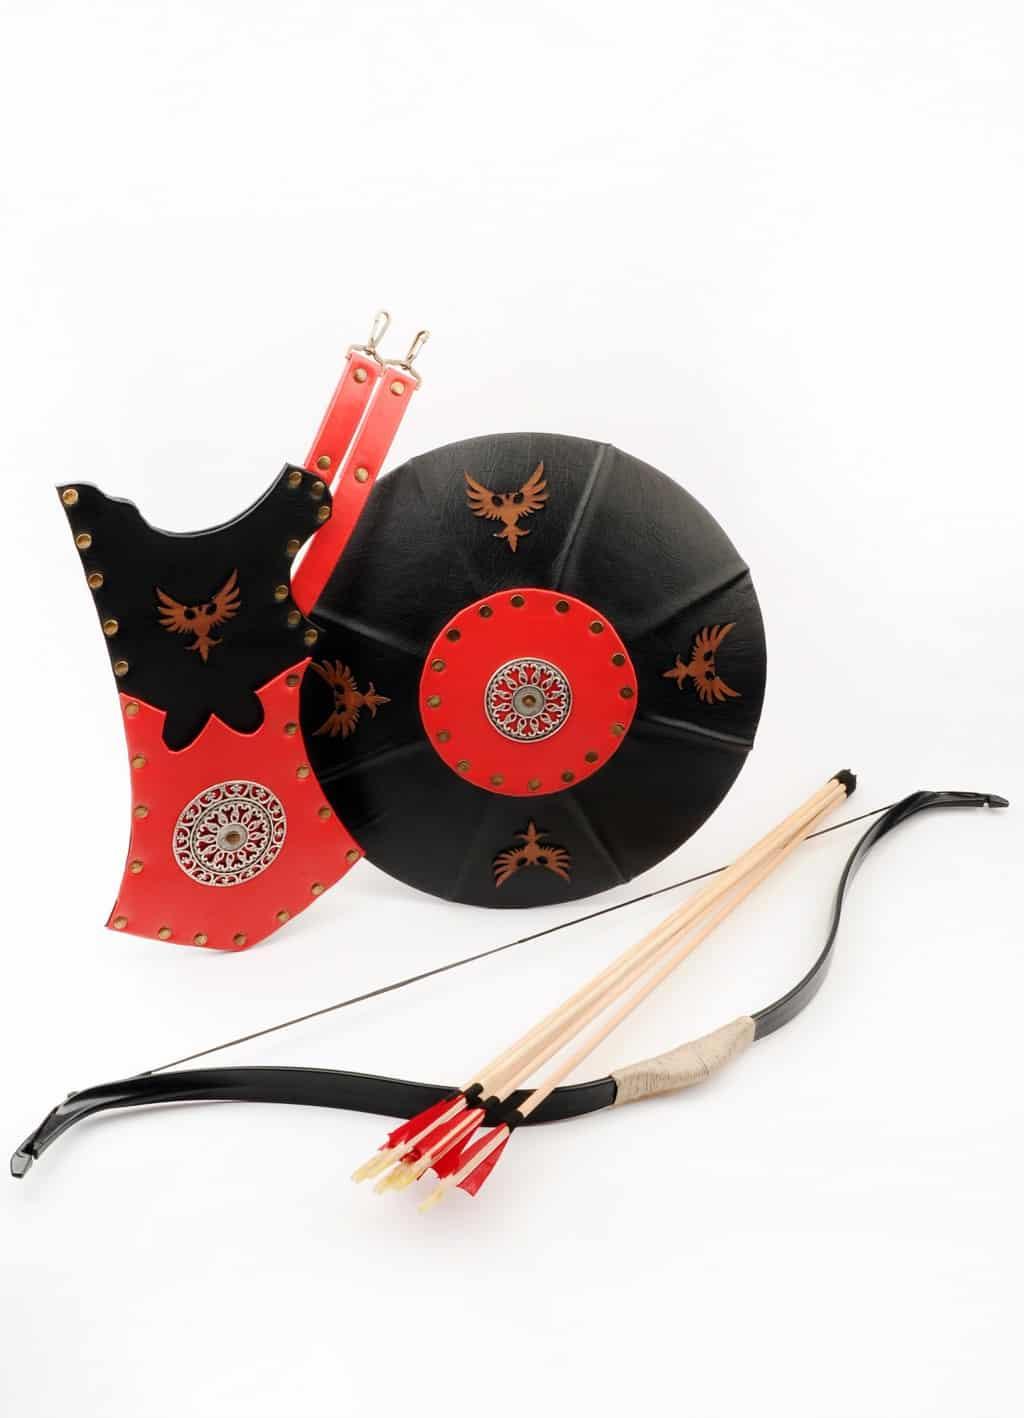 Ottoman Archery Equipments